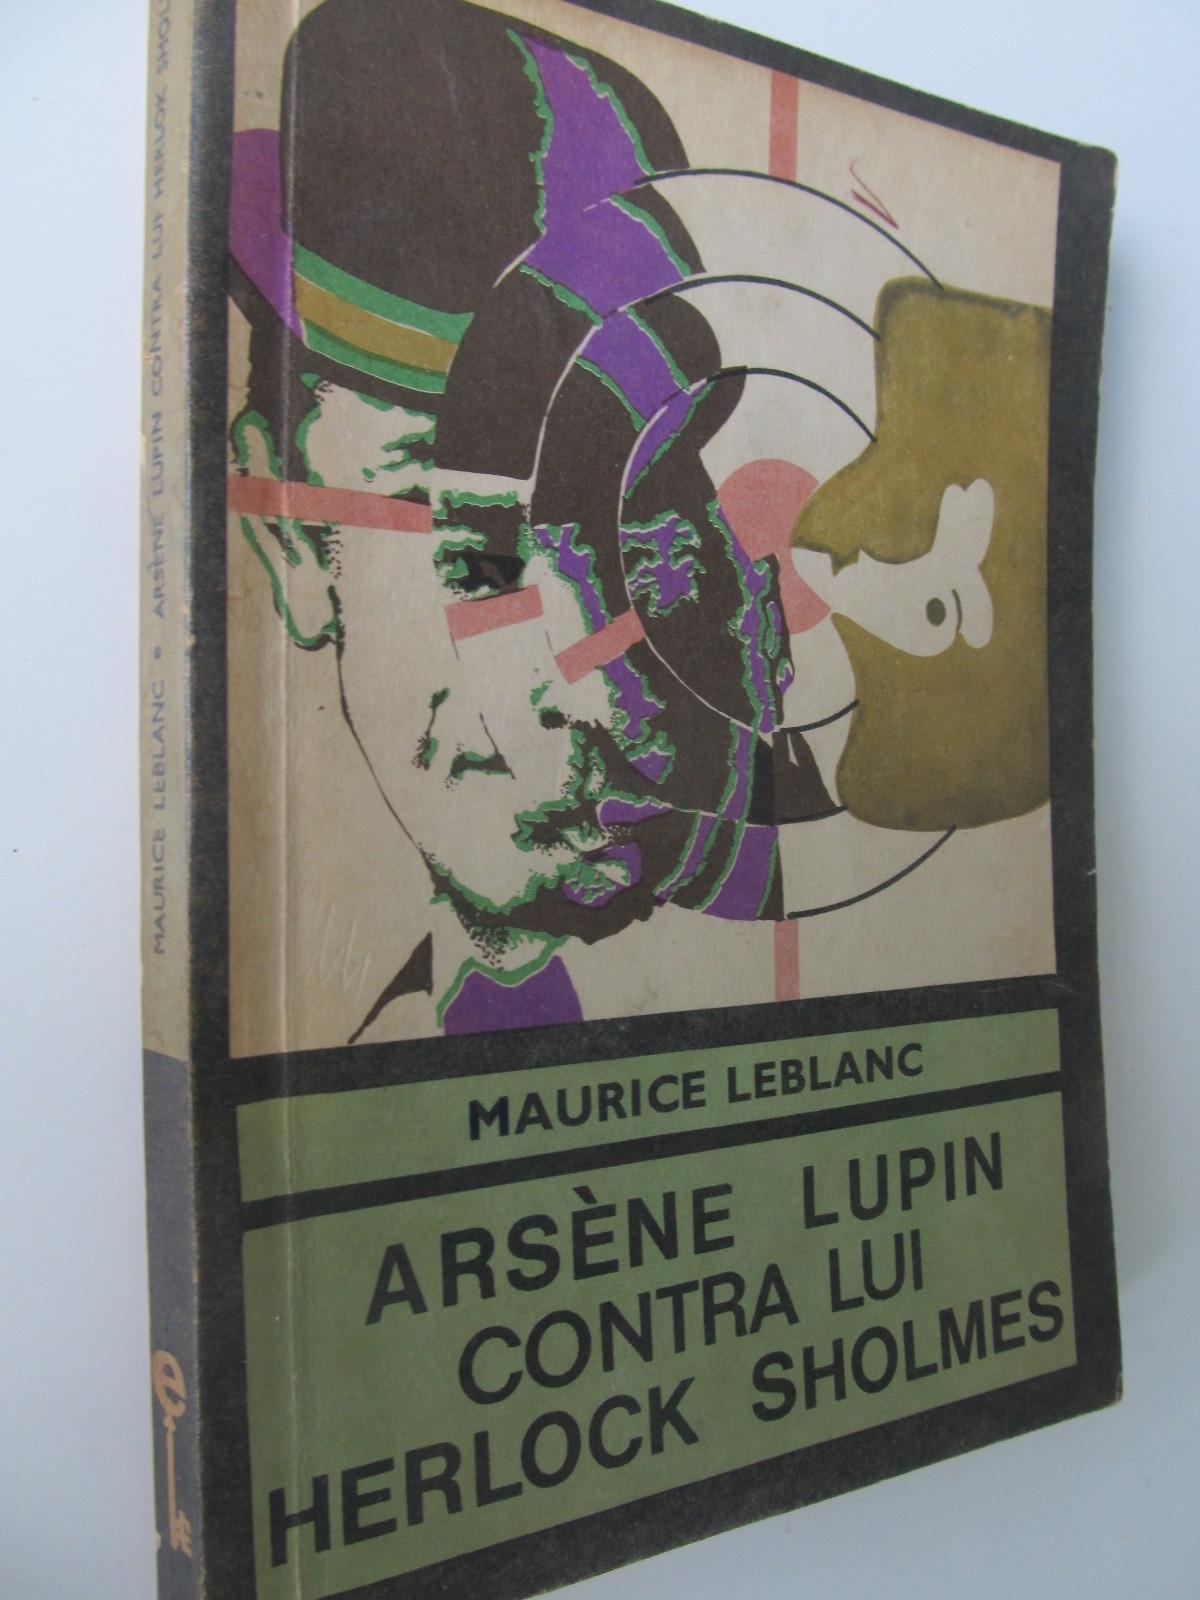 Arsene Lupin contra lui Herlock Sholmes - Maurice Leblanc | Detalii carte